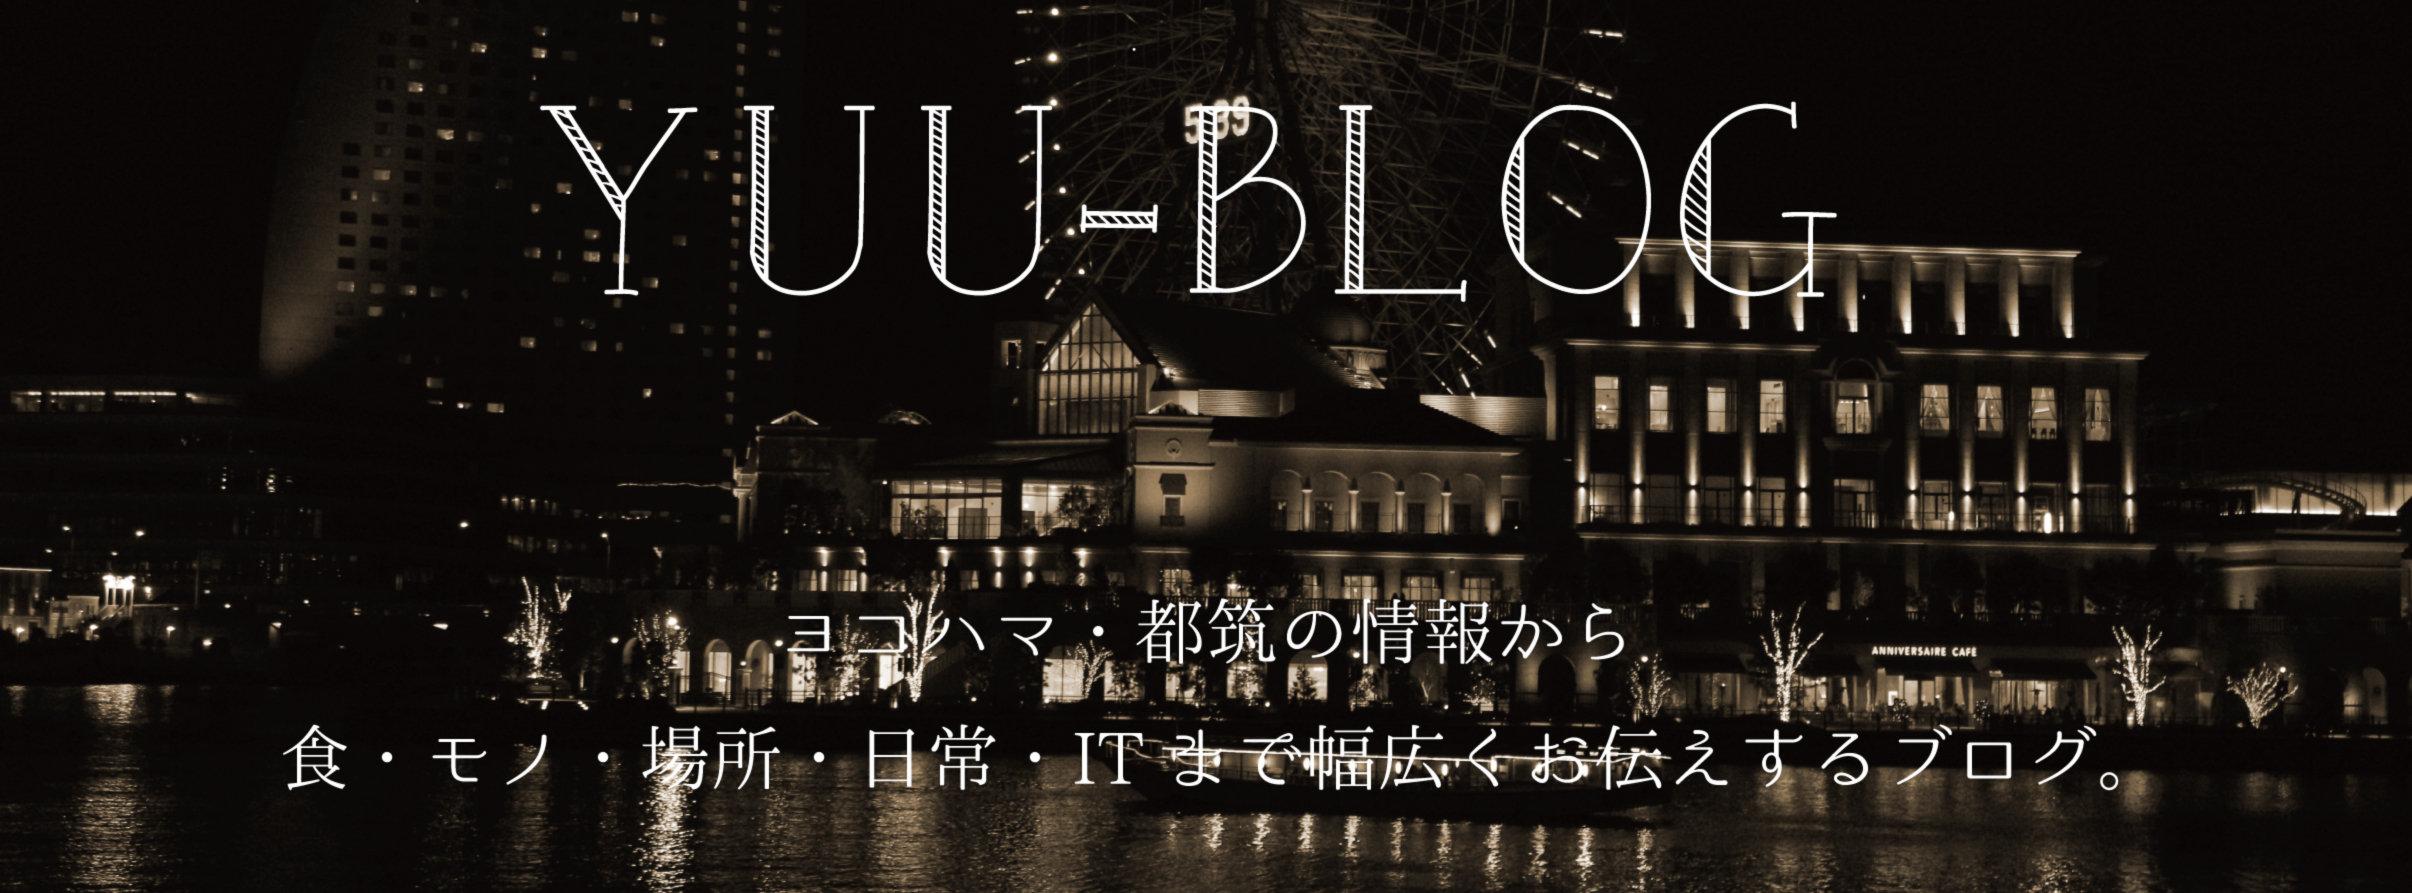 YUU-BLOG 都筑・横浜の情報を発信! イメージ画像